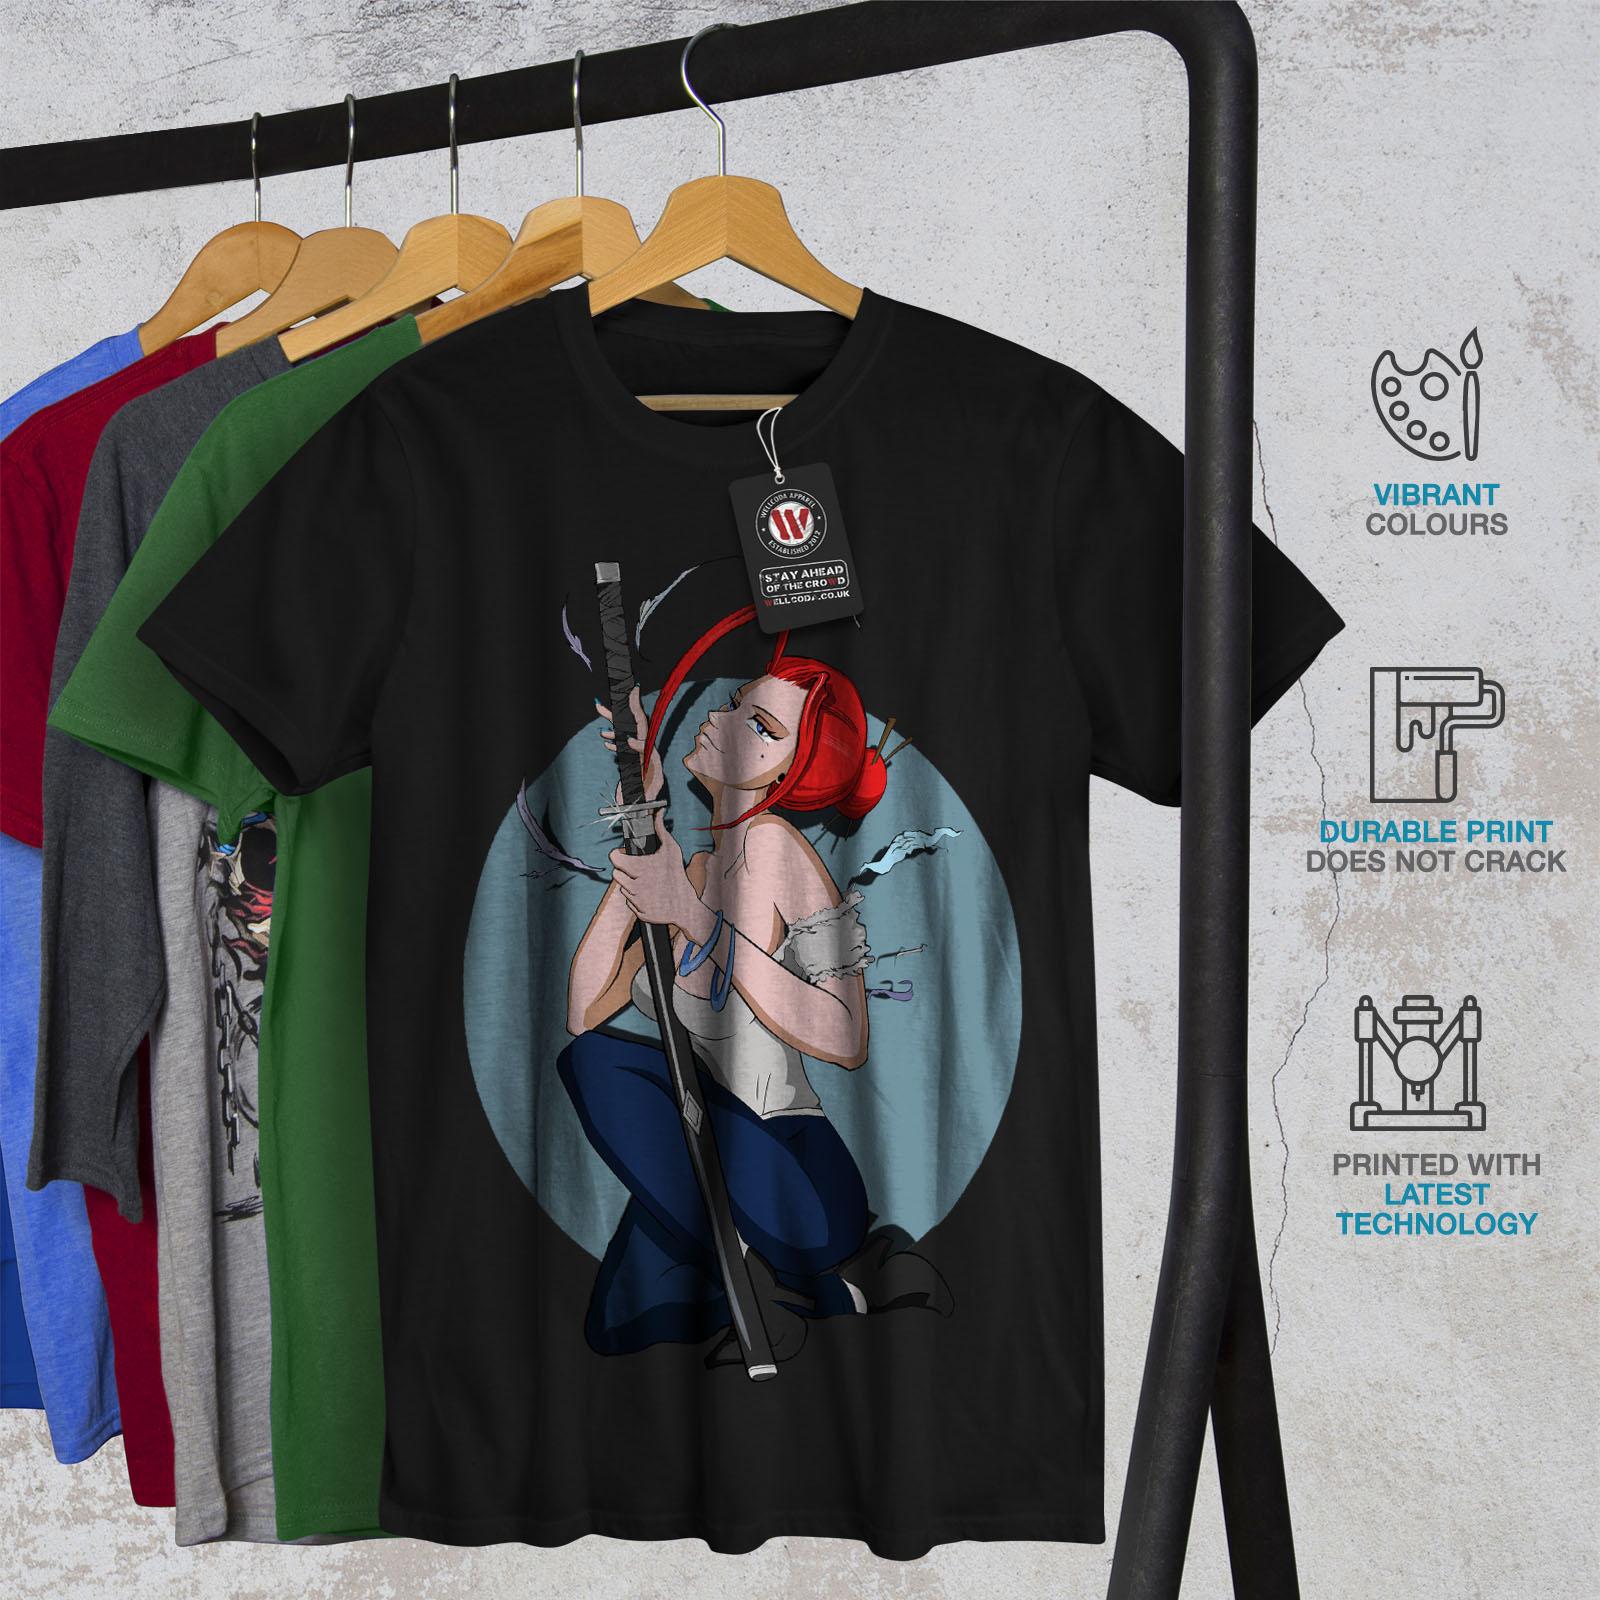 Wellcoda-Anime-Katana-Girl-Mens-T-shirt-Japanese-Graphic-Design-Printed-Tee thumbnail 6